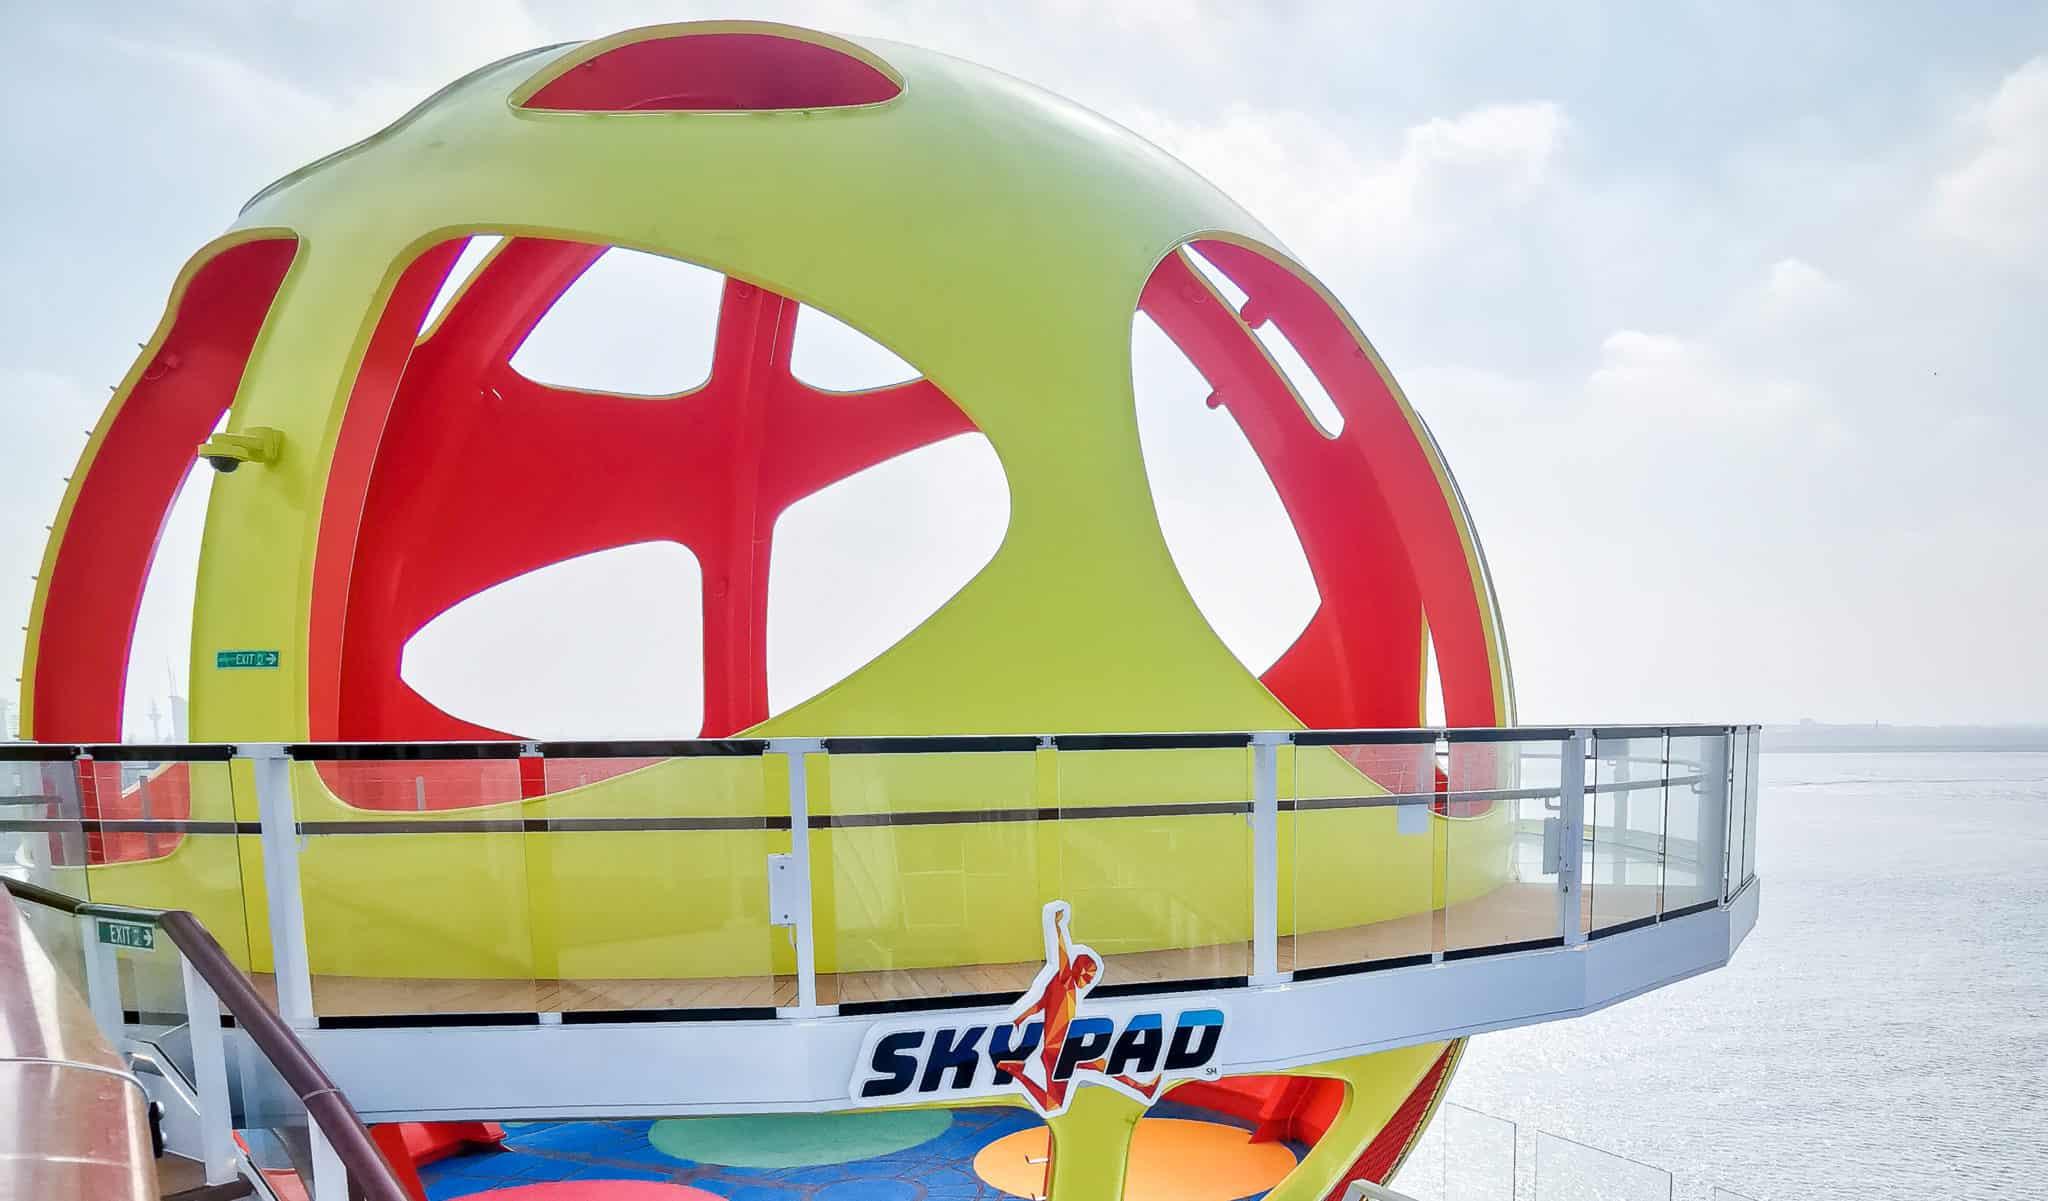 sky pad bungee trampoline royal caribbean